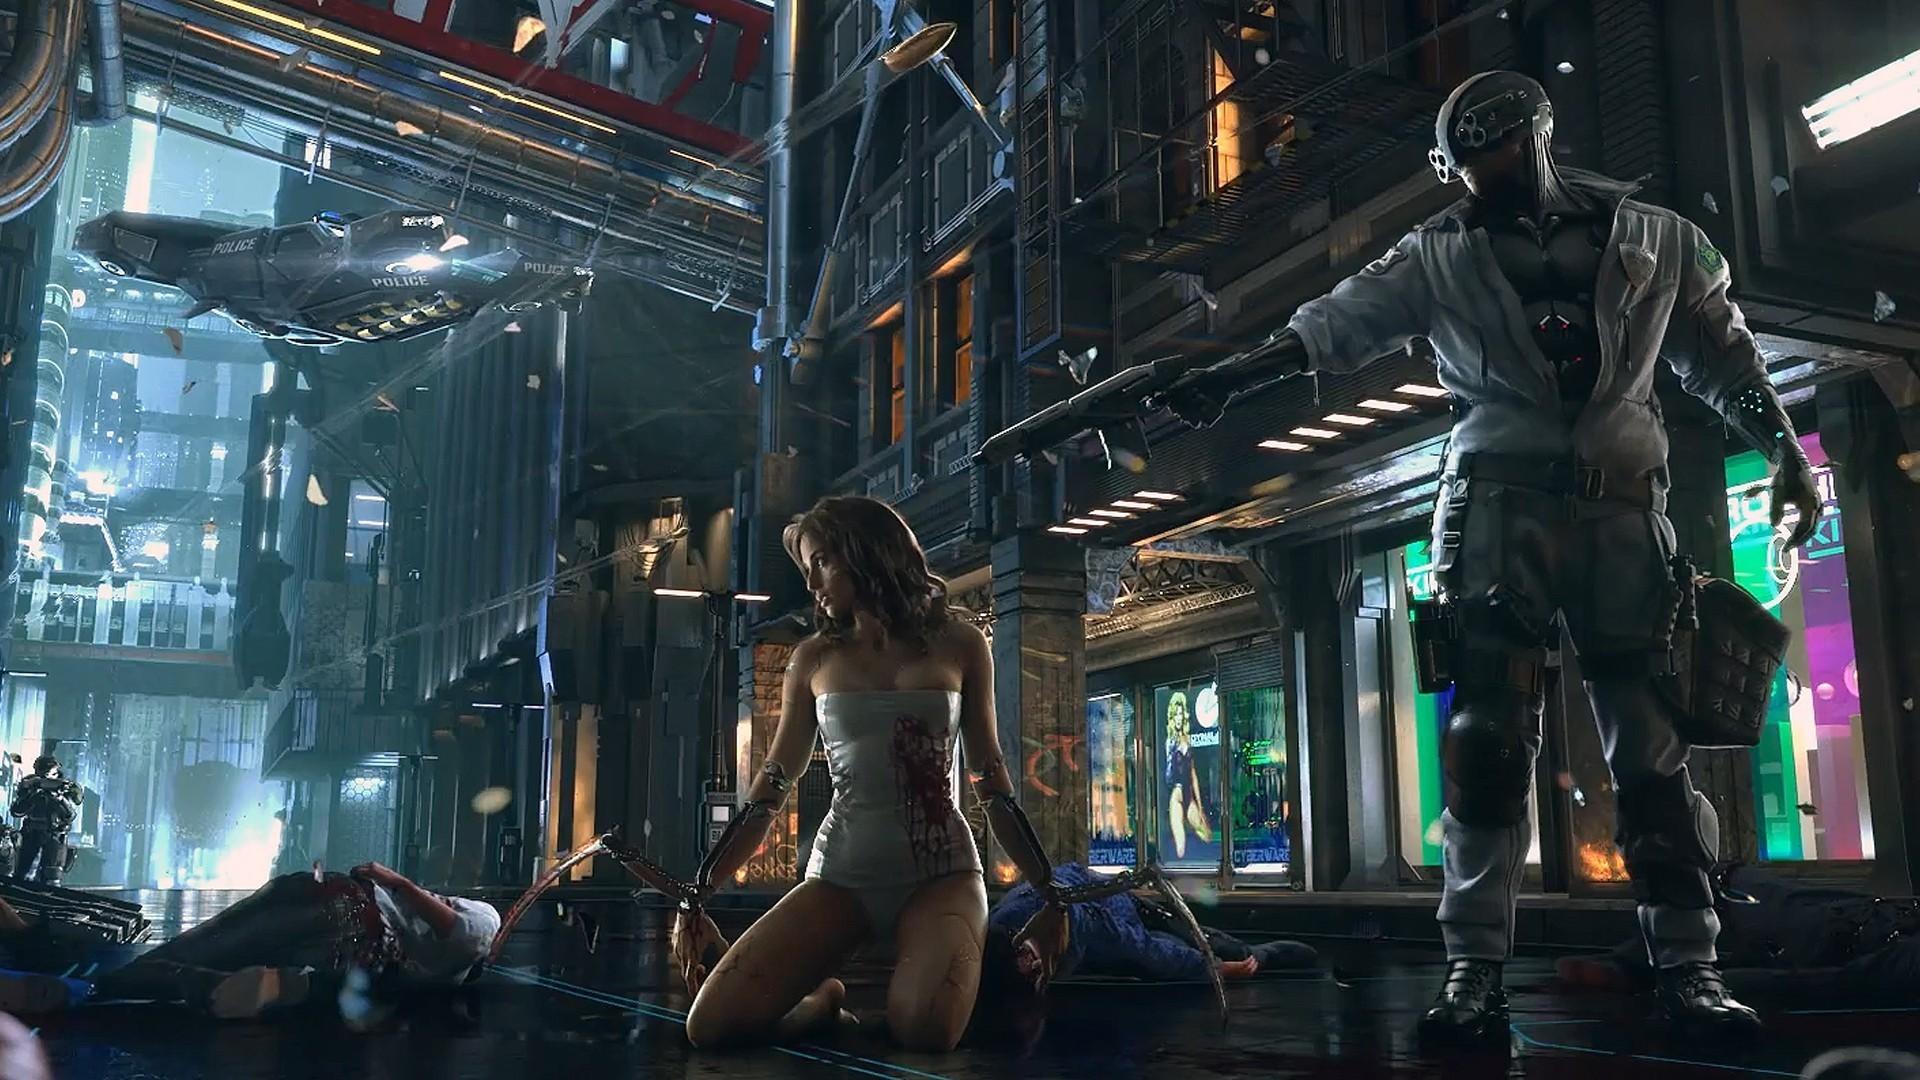 Cyber porn video games adult scene